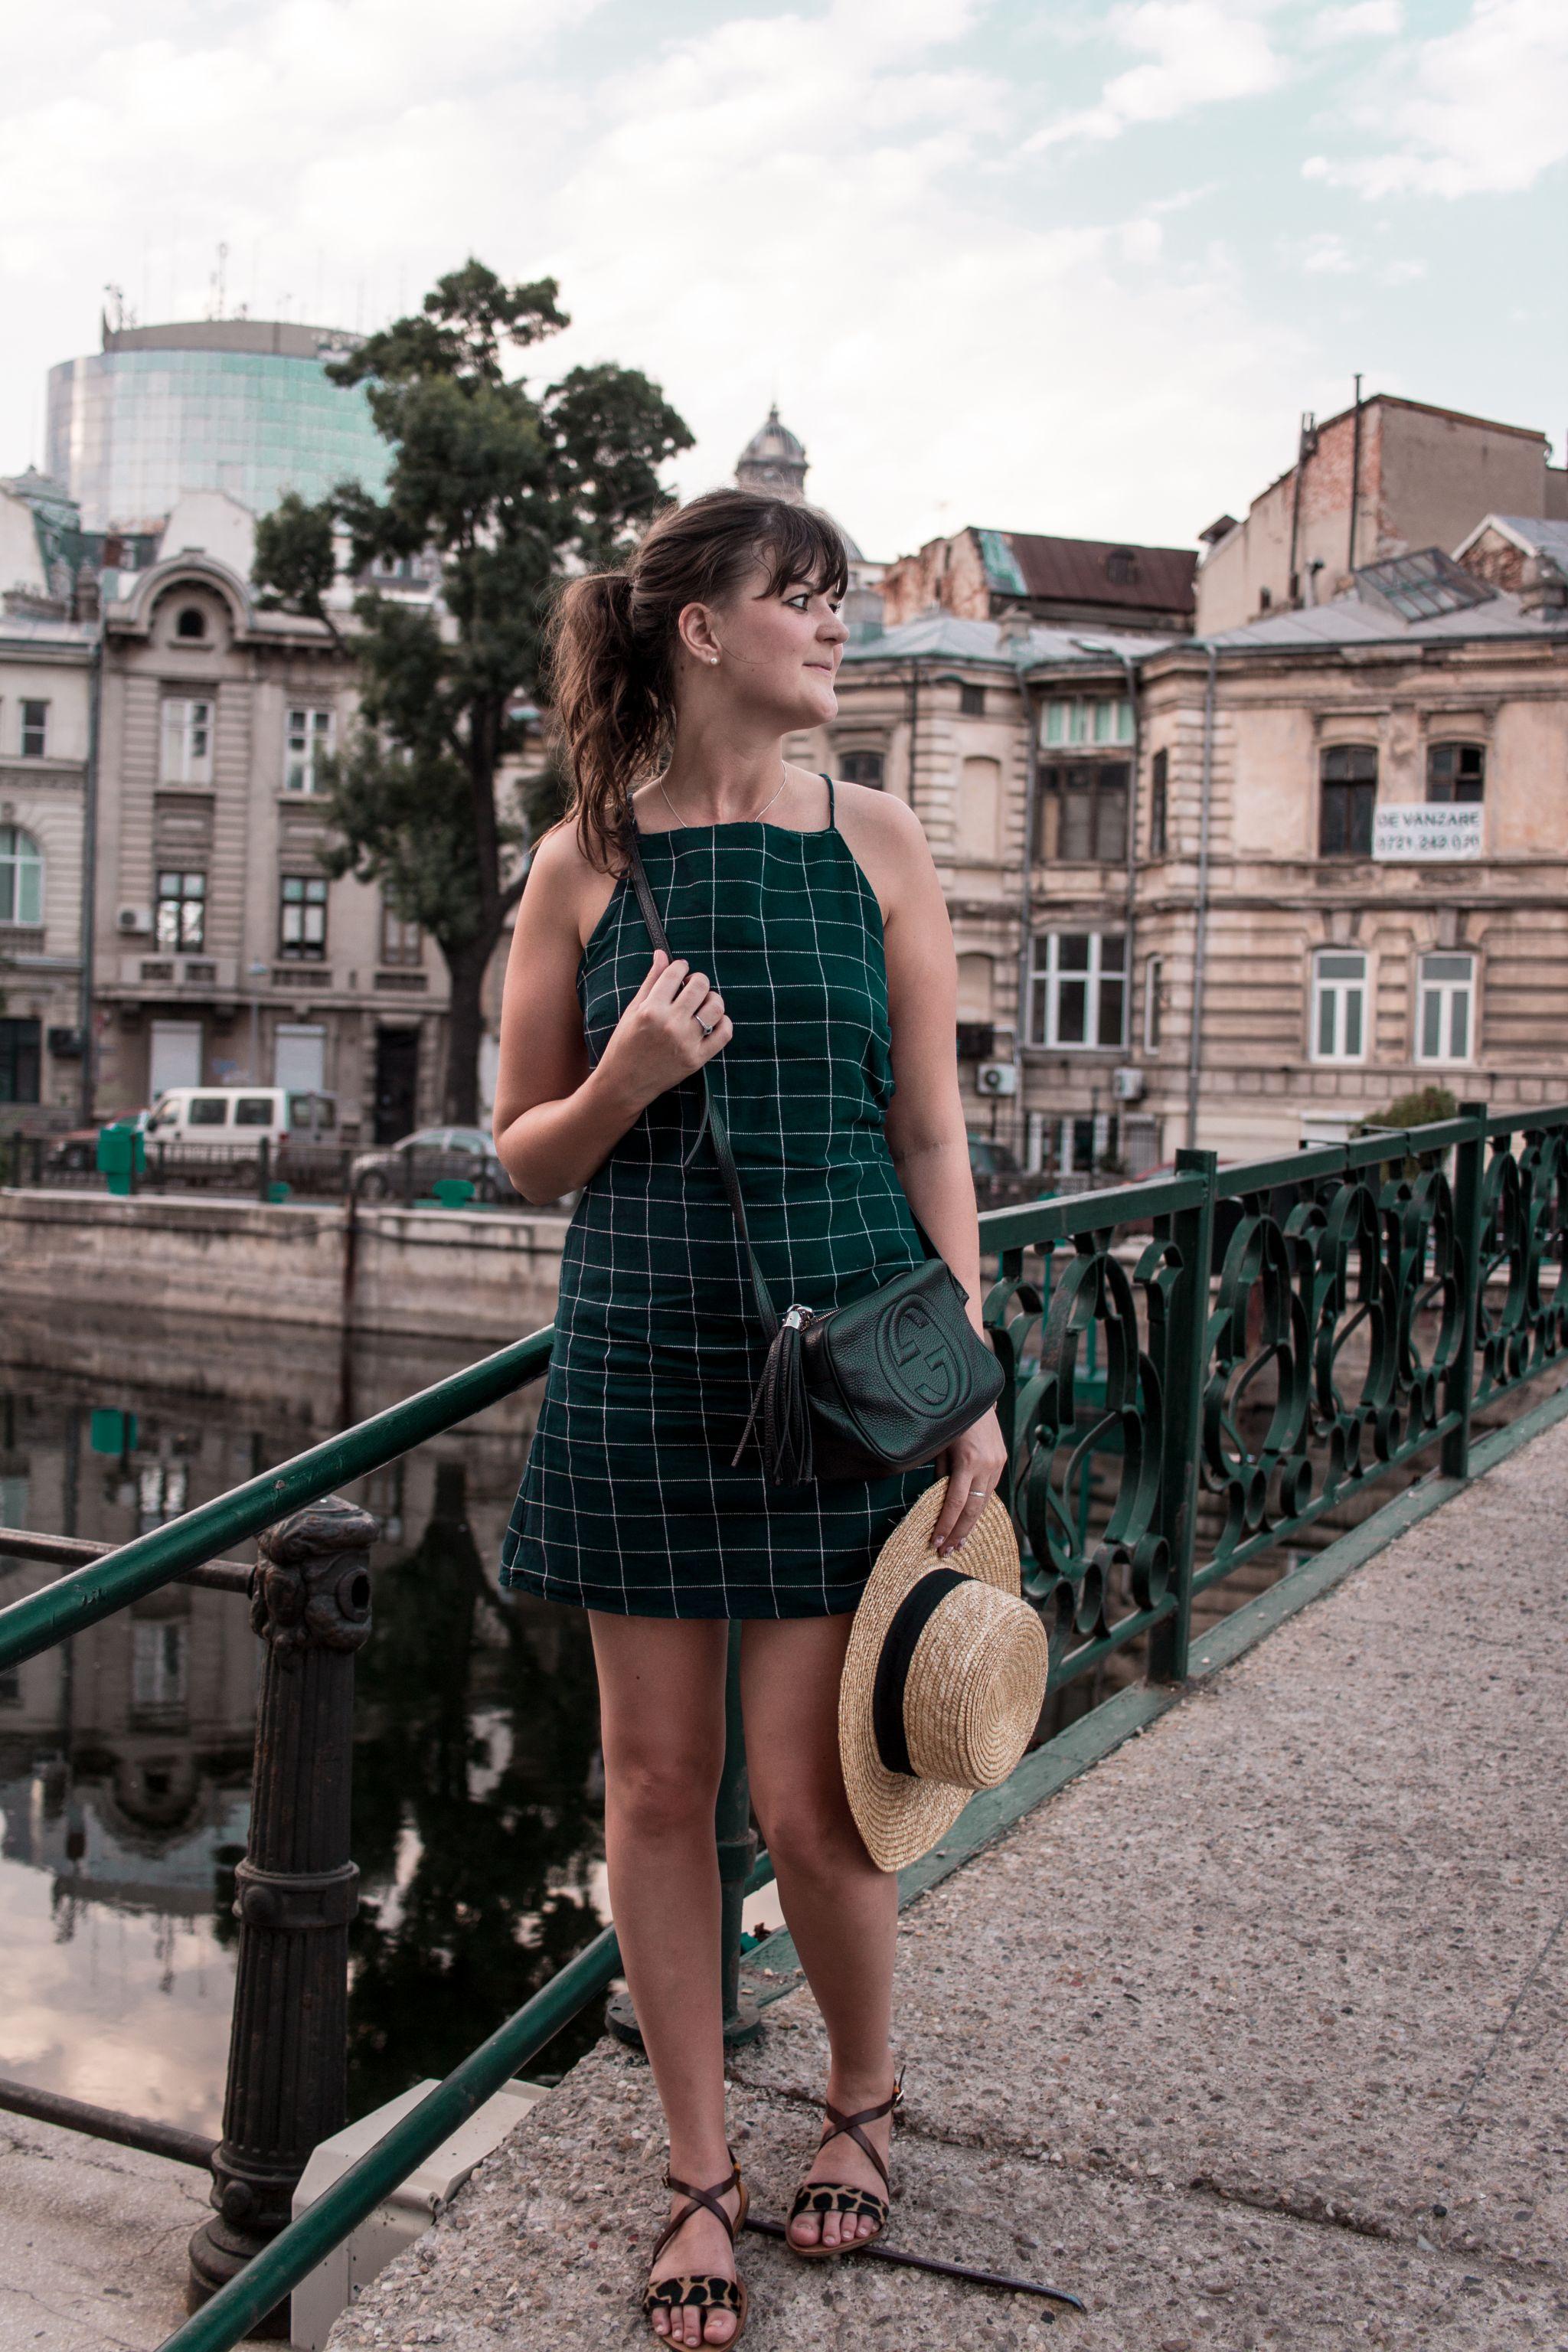 Bucharest Canals